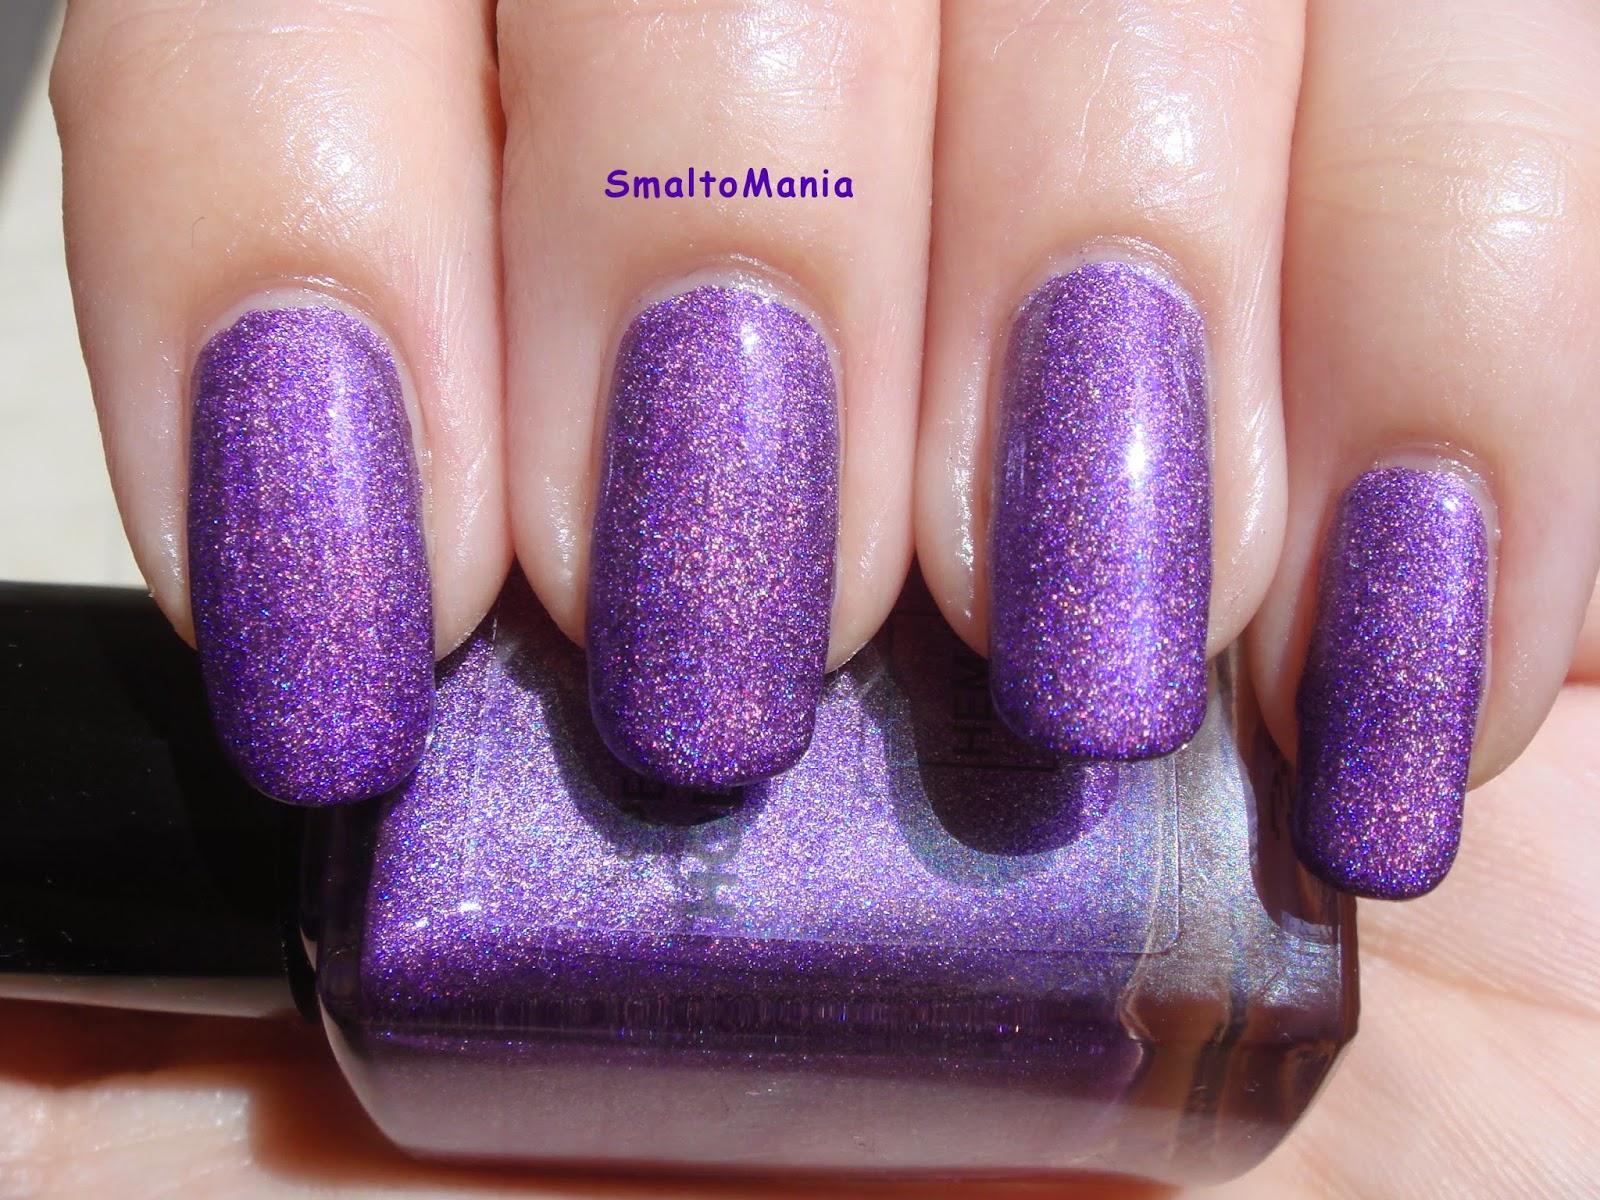 Hema n.55 Holographic Purple